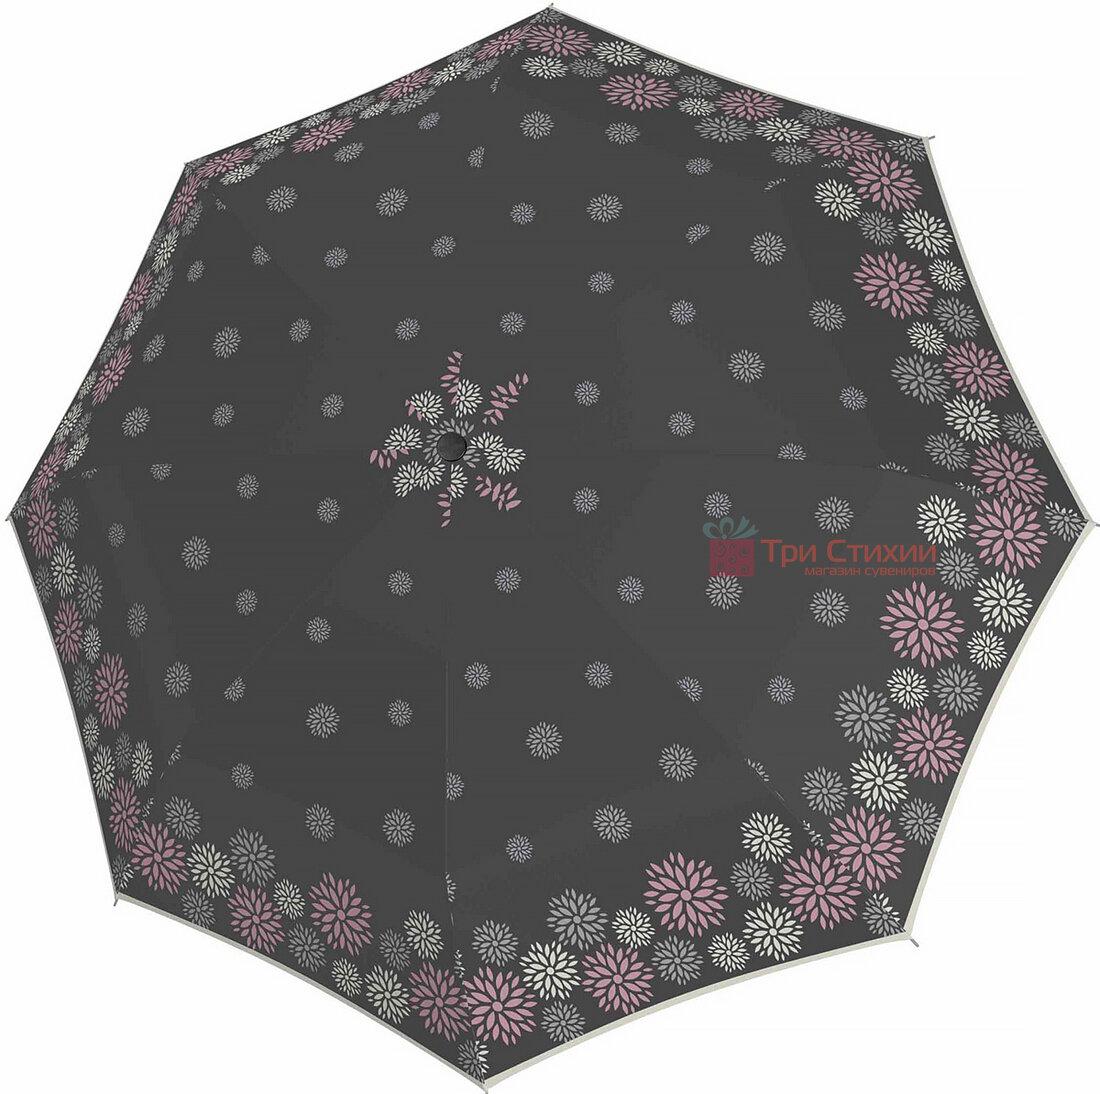 Зонт складной Doppler 7301652902-1 полуавтомат Серые цветы, Цвет: Серый, фото